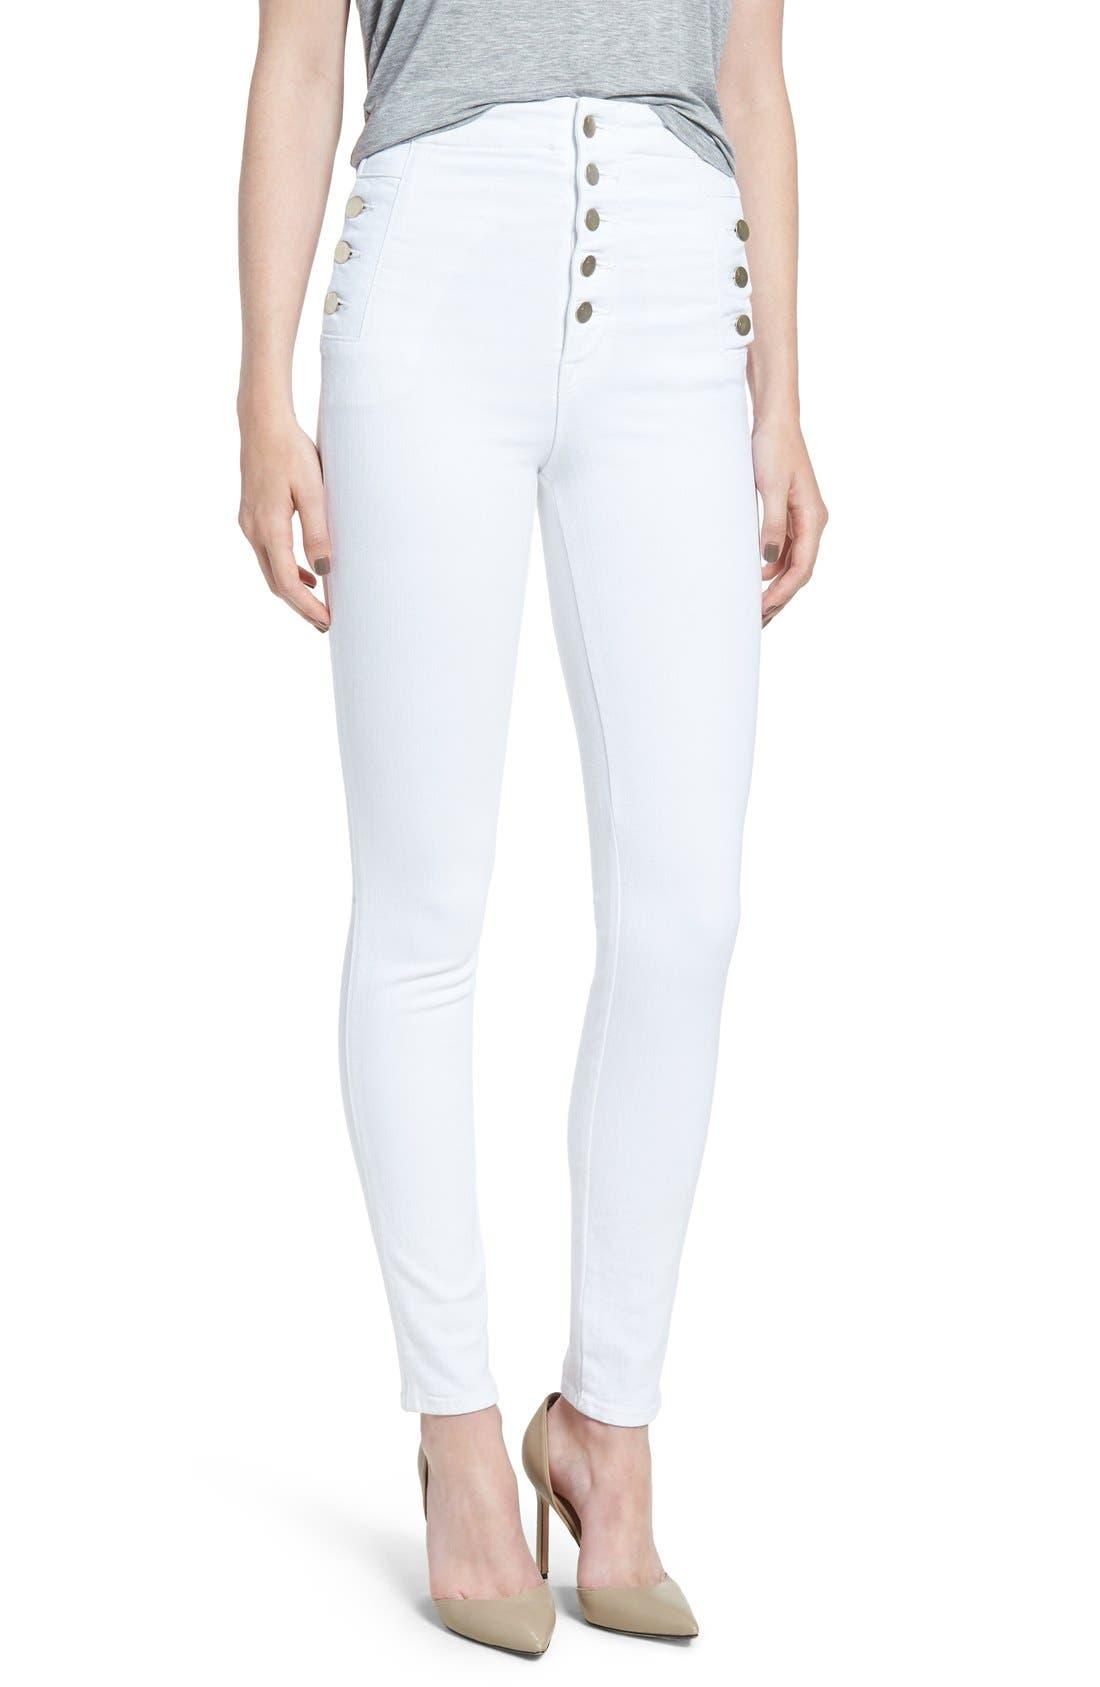 'Natasha Sky High' High Rise Skinny Jeans,                             Alternate thumbnail 9, color,                             100